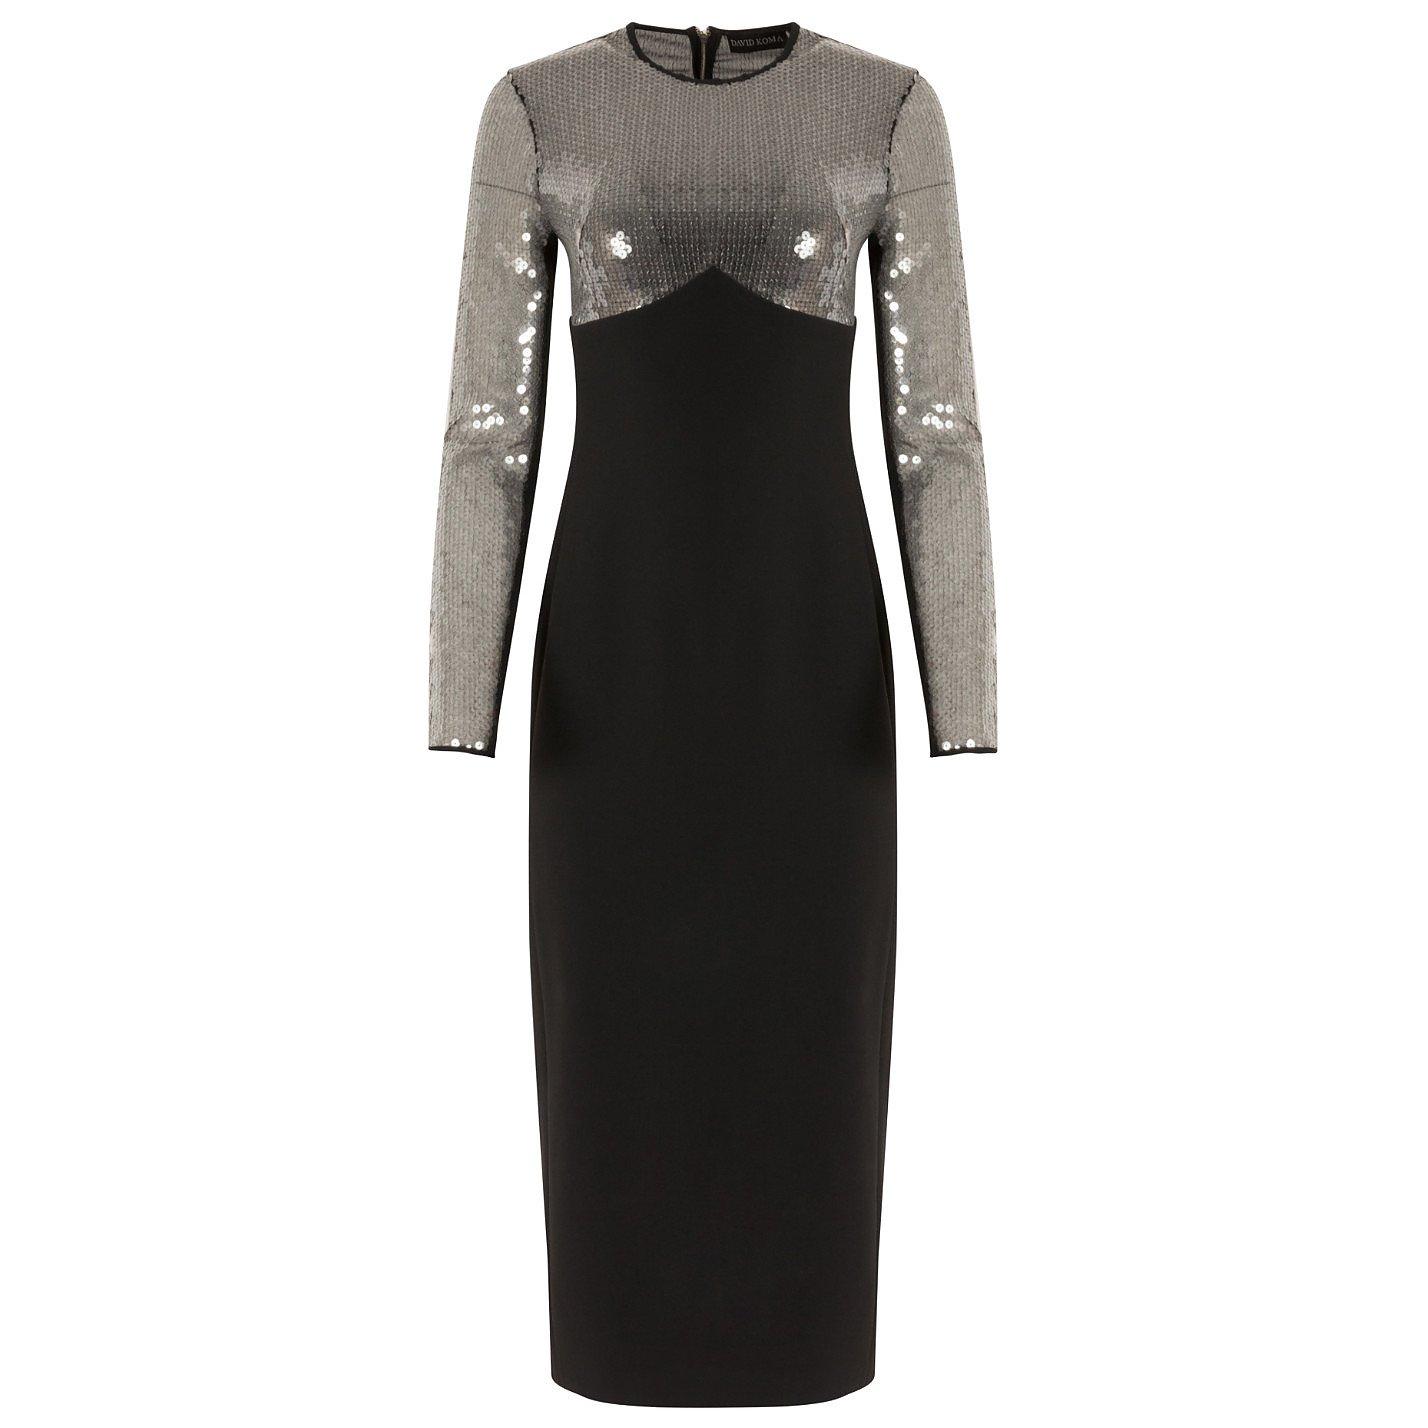 David Koma Sequin-Embellished Midi Dress